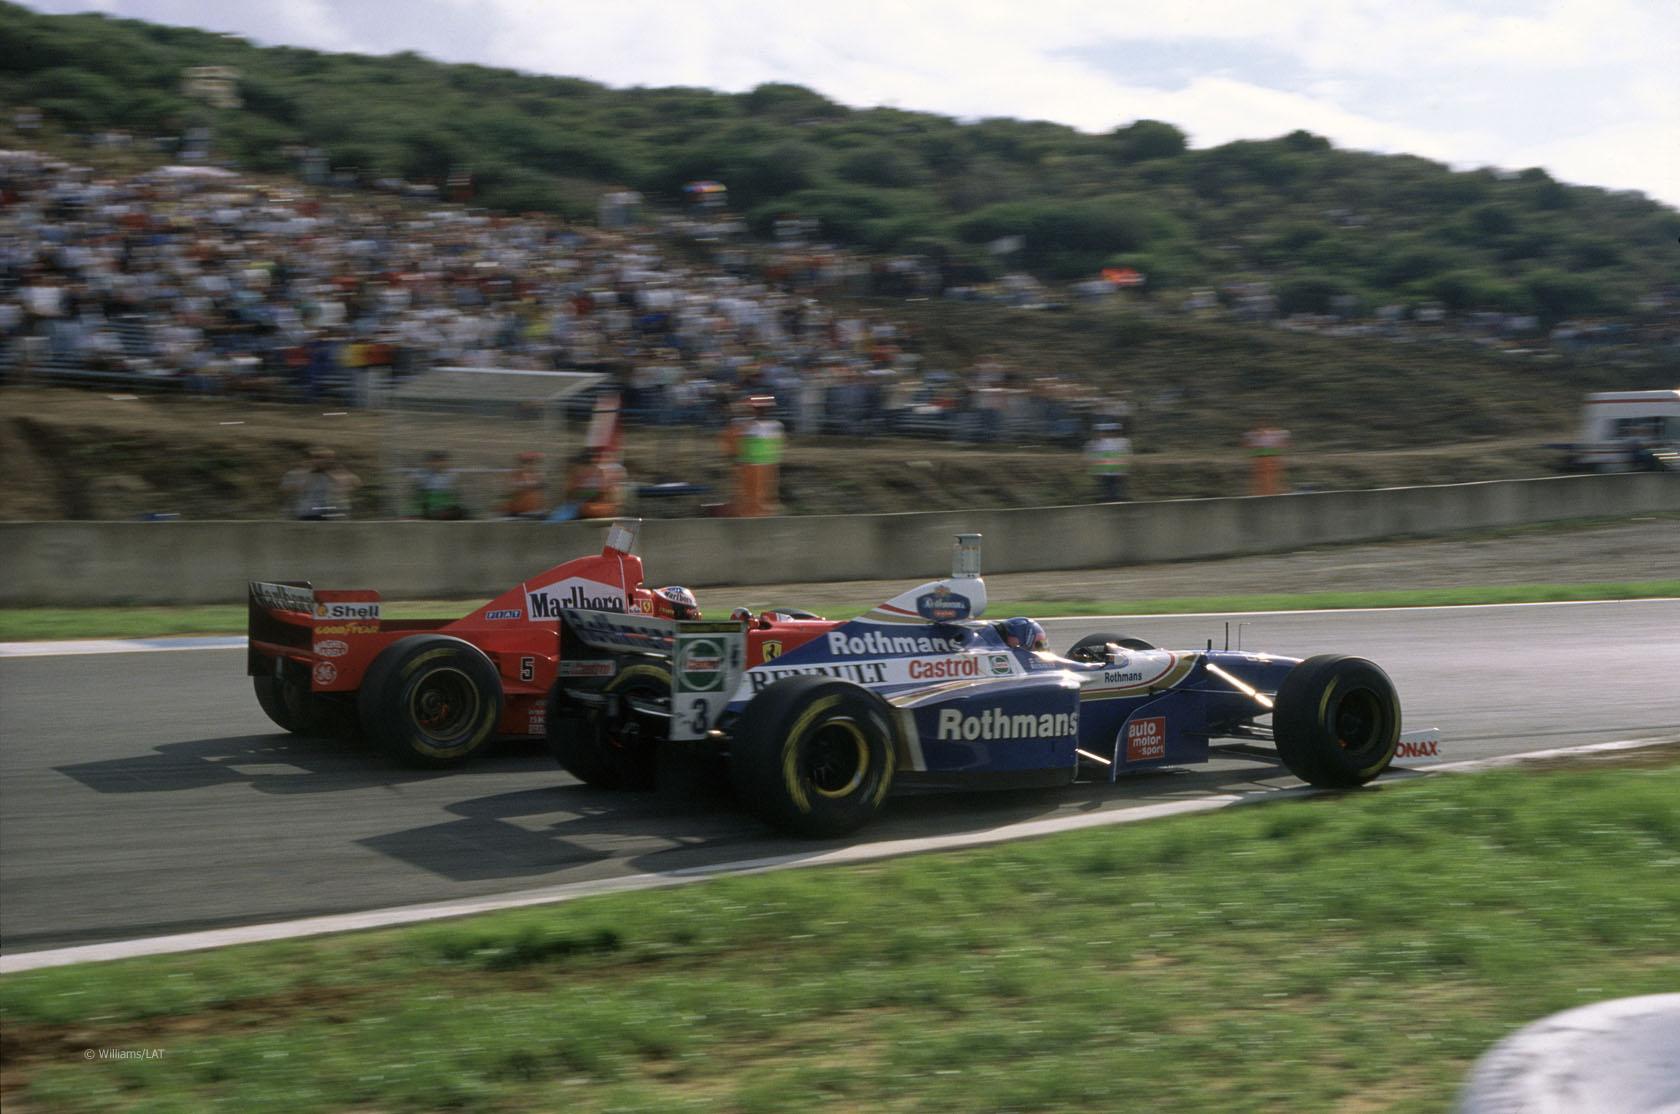 1997 European Grand Prix